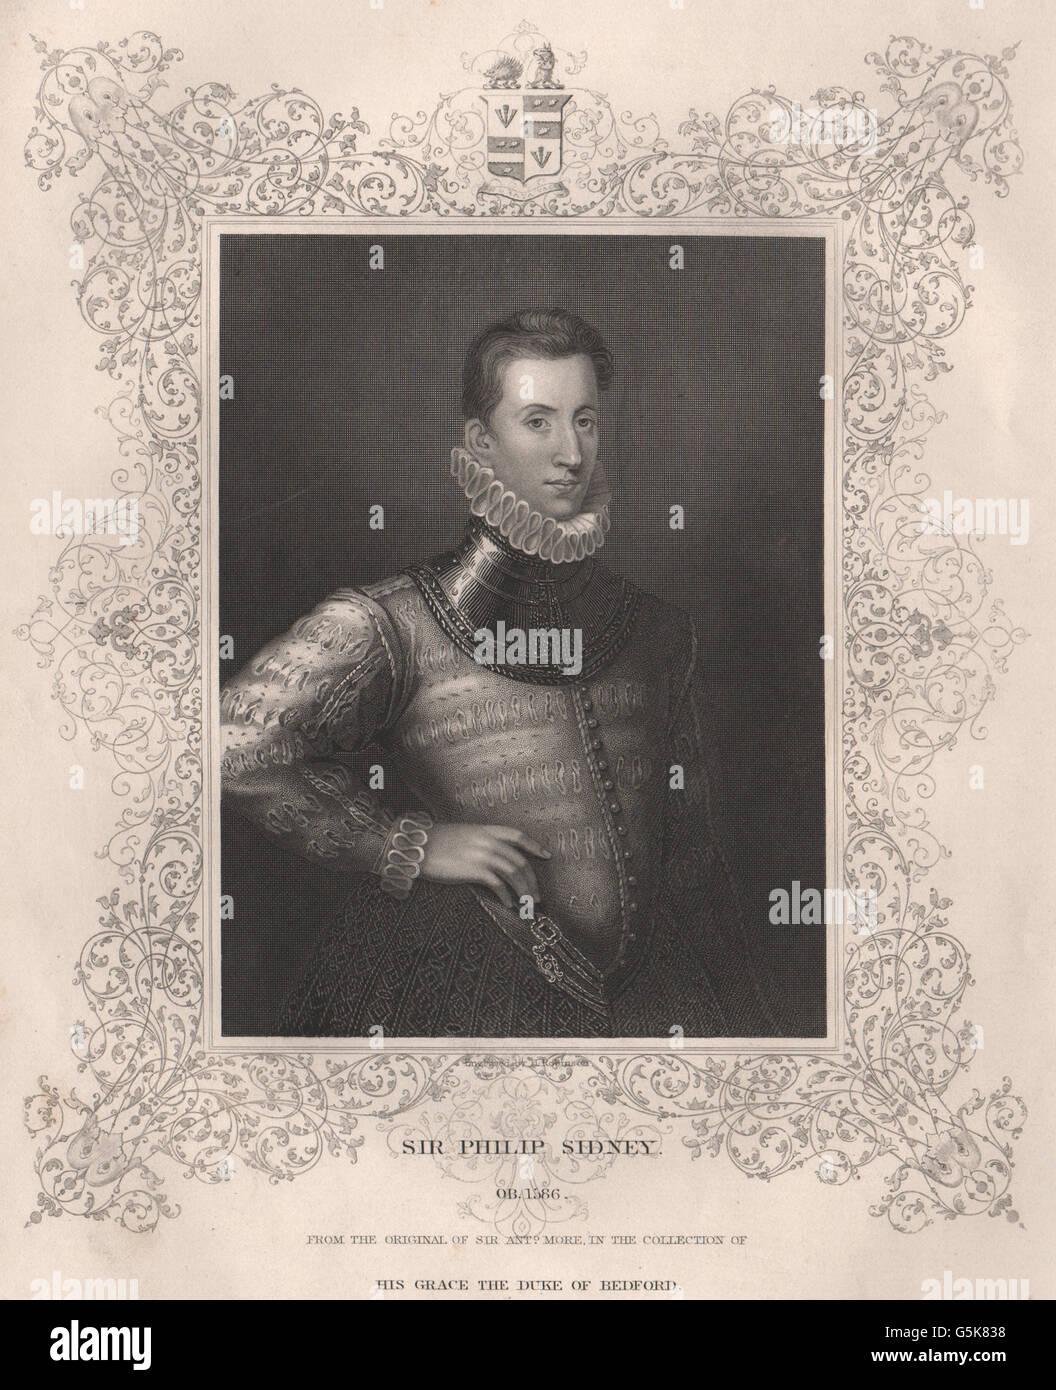 BRITISH HISTORY: Sir Philip Sidney. TALLIS, antique print 1853 - Stock Image